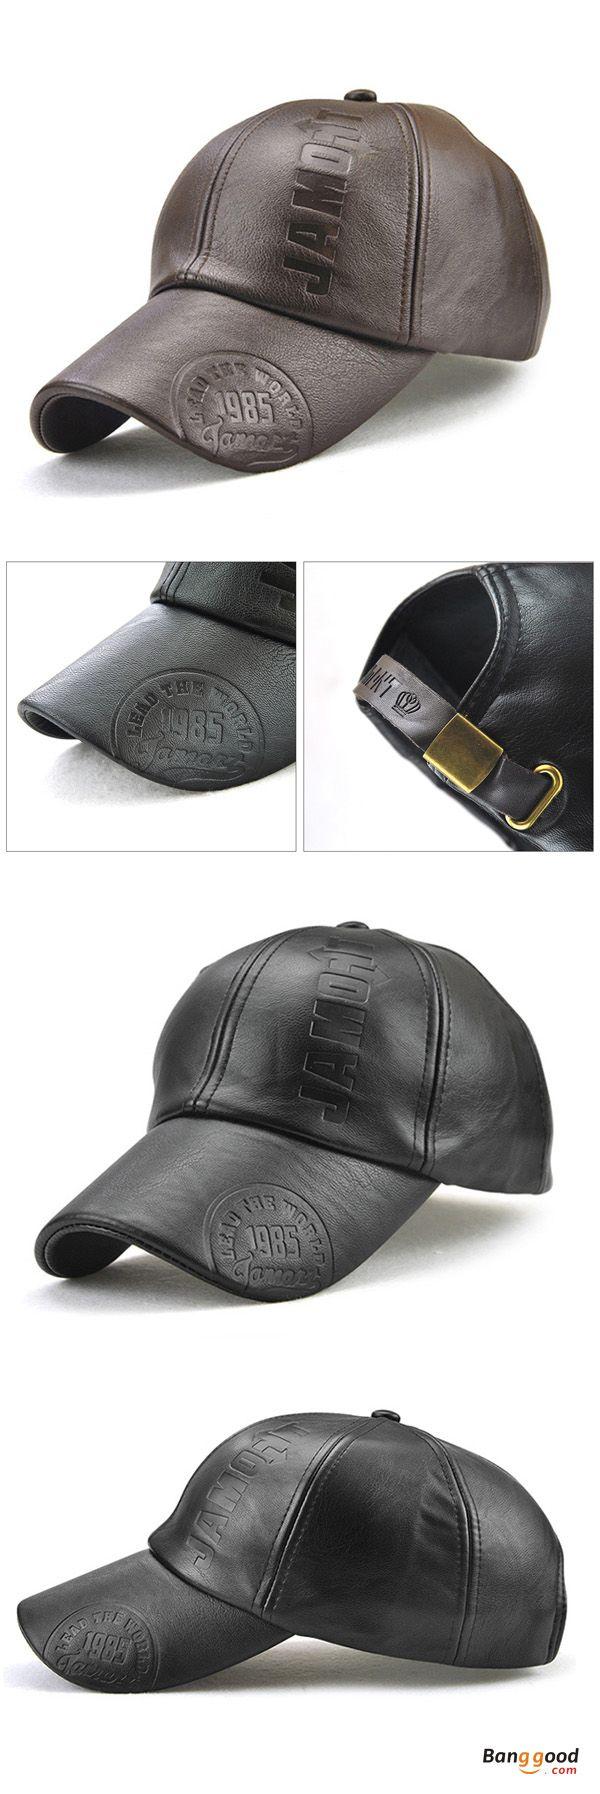 d012c4d547b Mens Letter Man-made Leather Warm Baseball Cap Adjustable Outdoor ...